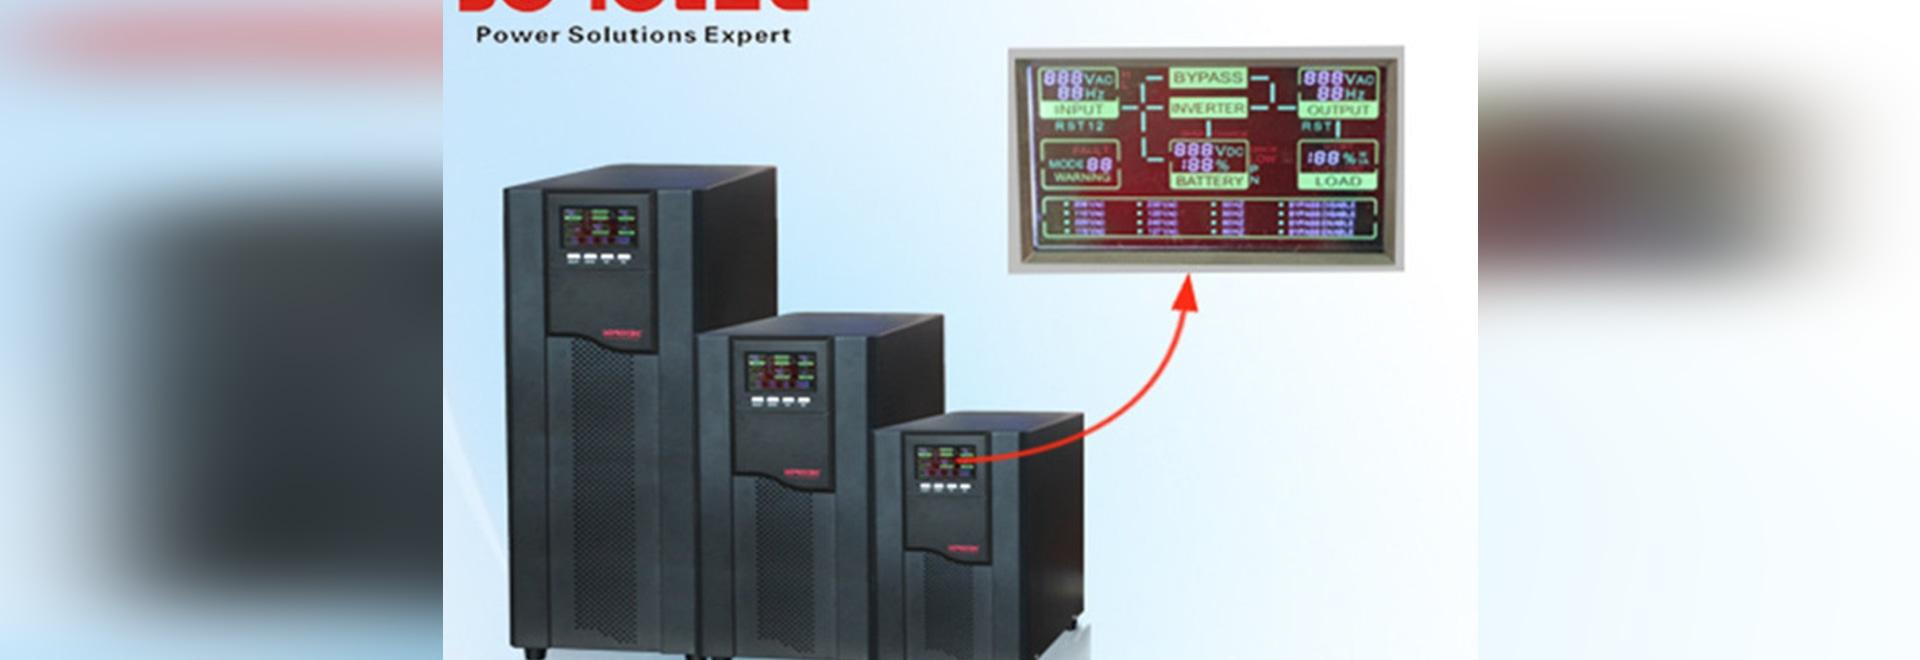 High Frequency Online UPS Power Supply 1KVA-20KVA - Shenzhen